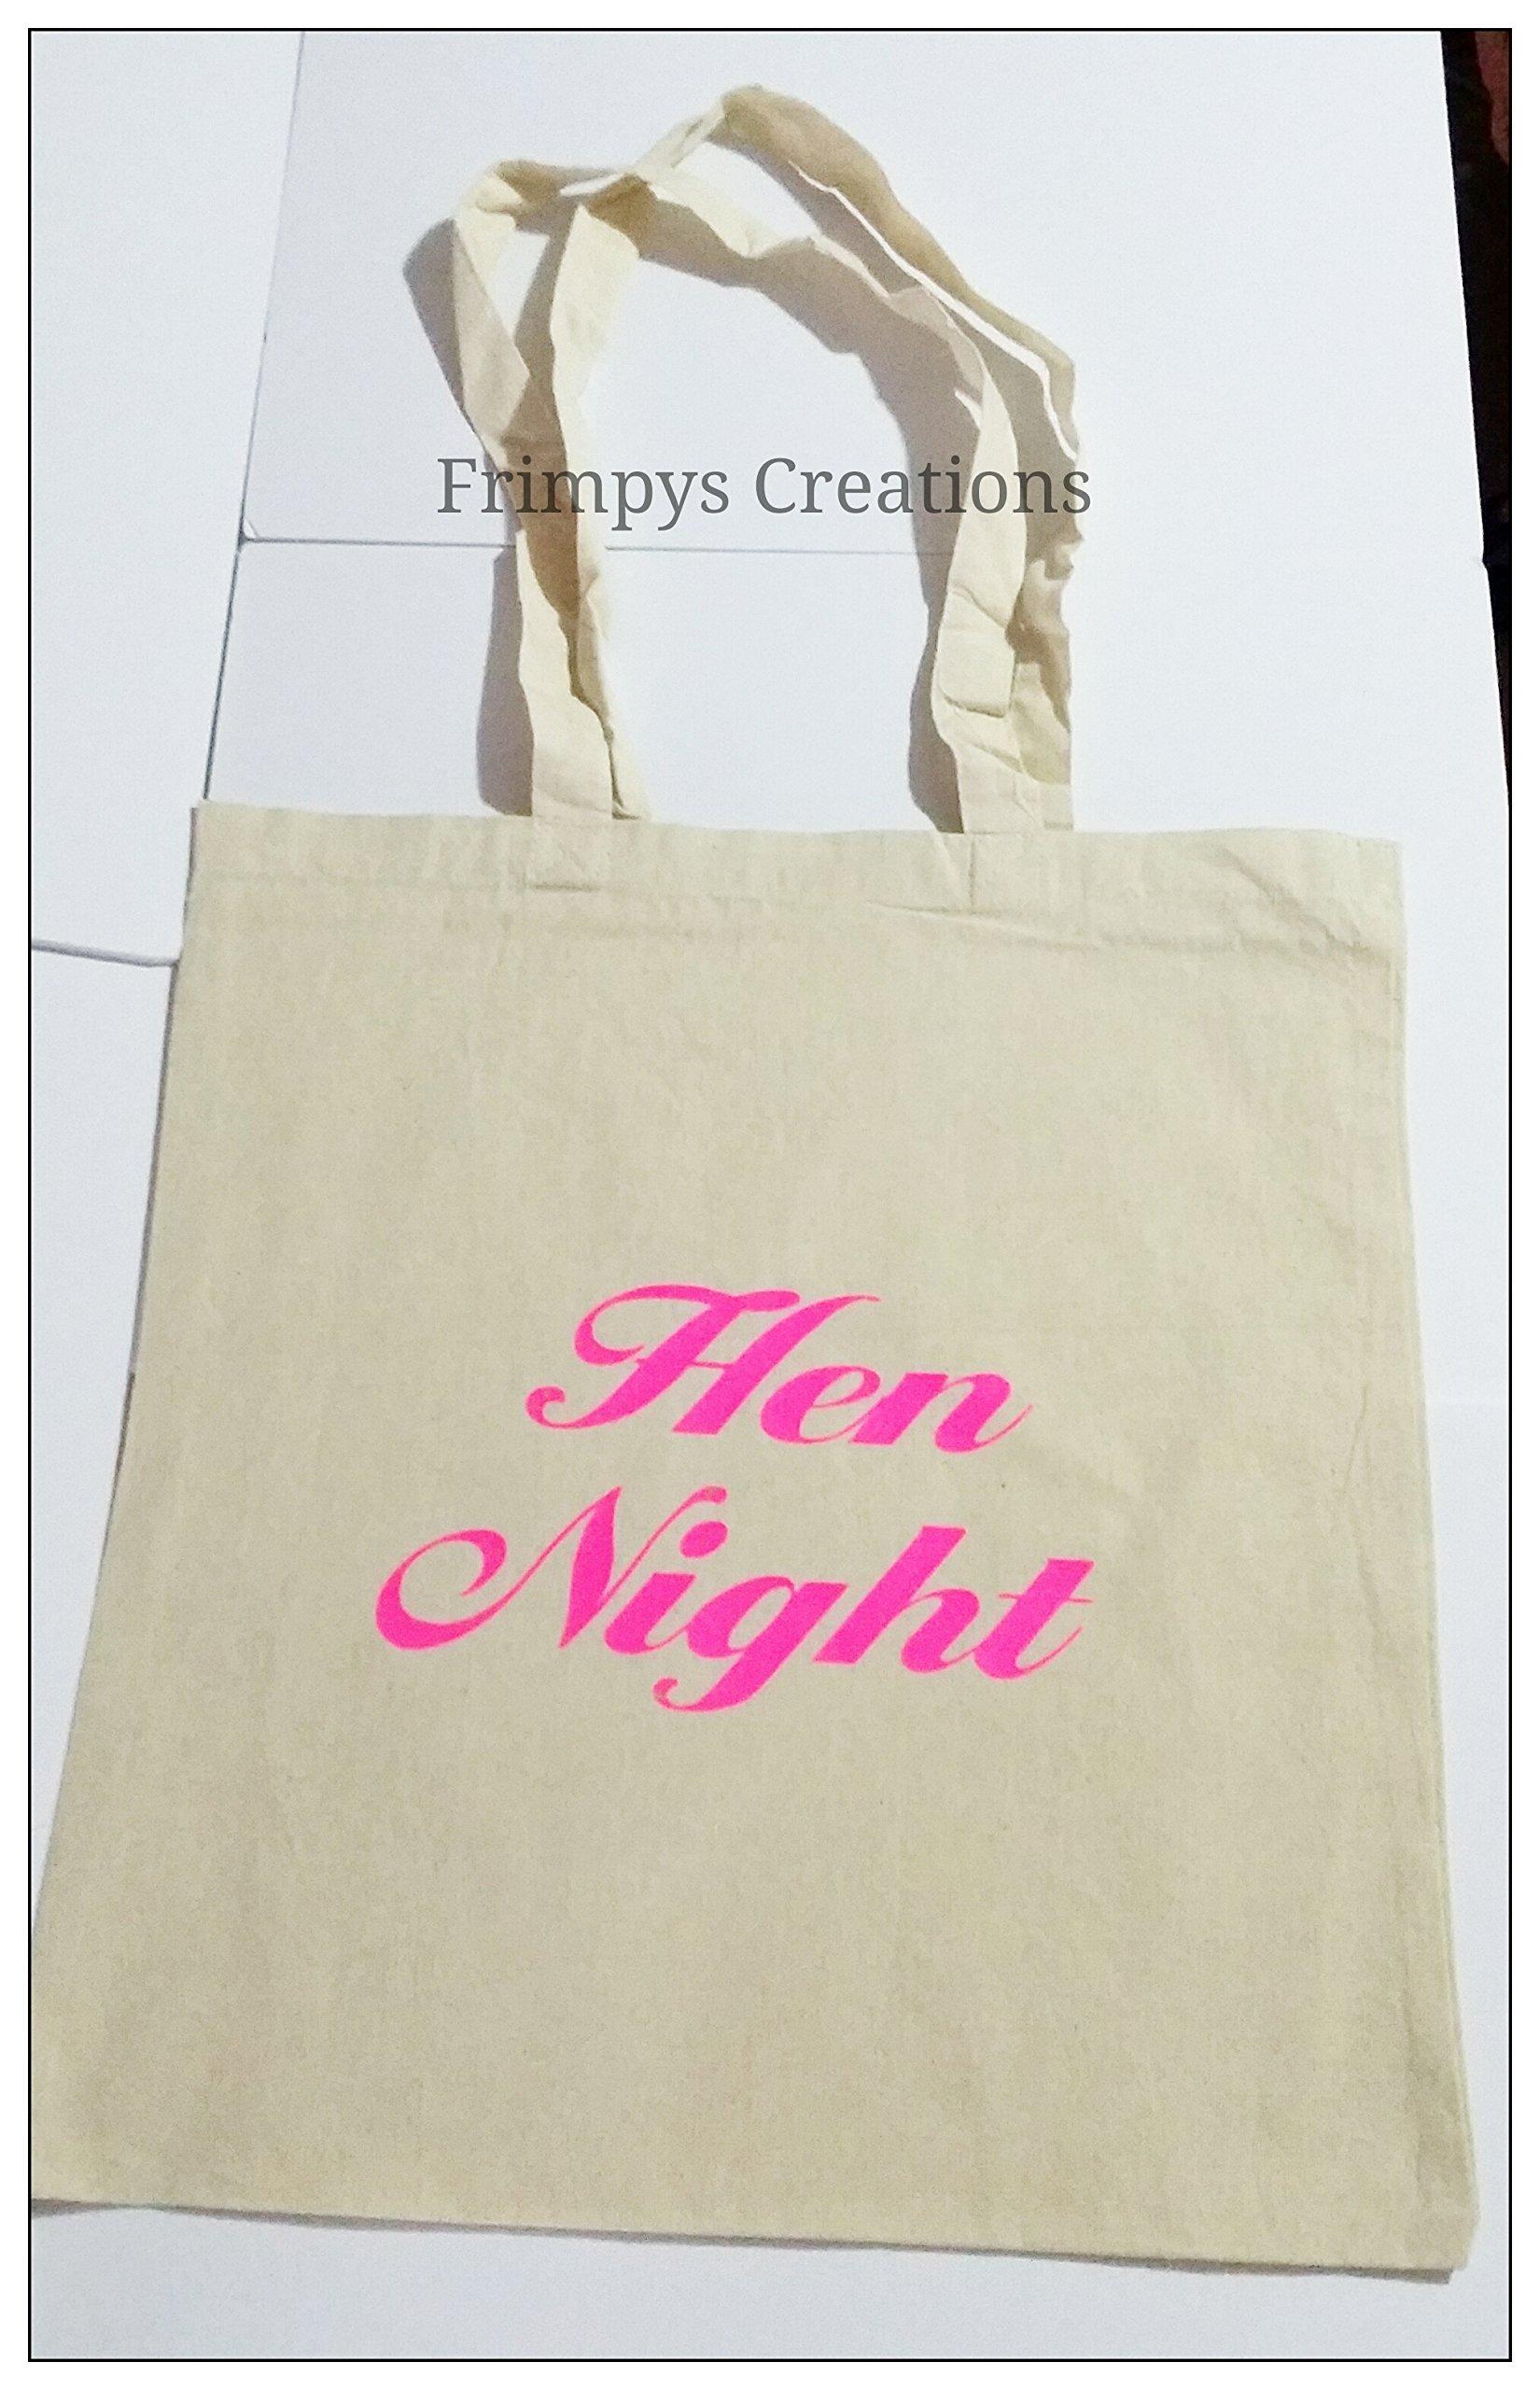 Wedding Favour Tote Bag cotton Printed Gift Present Keep Hen Night Novelty (BAG) - handmade-bags